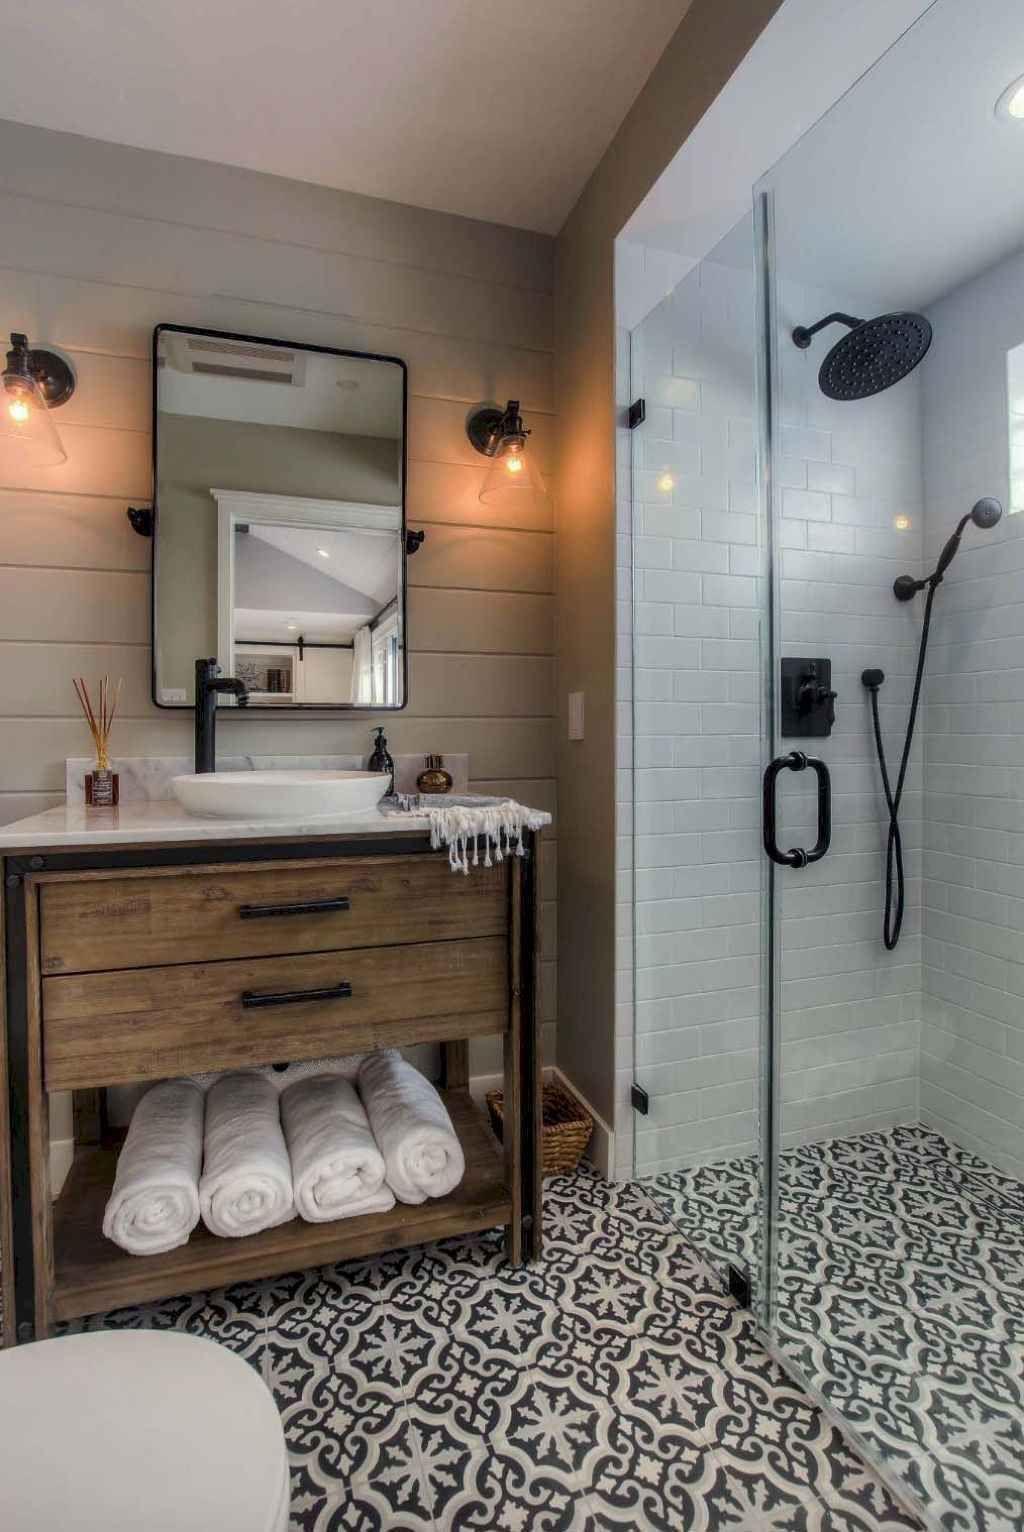 22 Stunning Farmhouse Bathroom Tiles Ideas Rustic Bathroom Designs Bathroom Remodel Master Small Bathroom Remodel